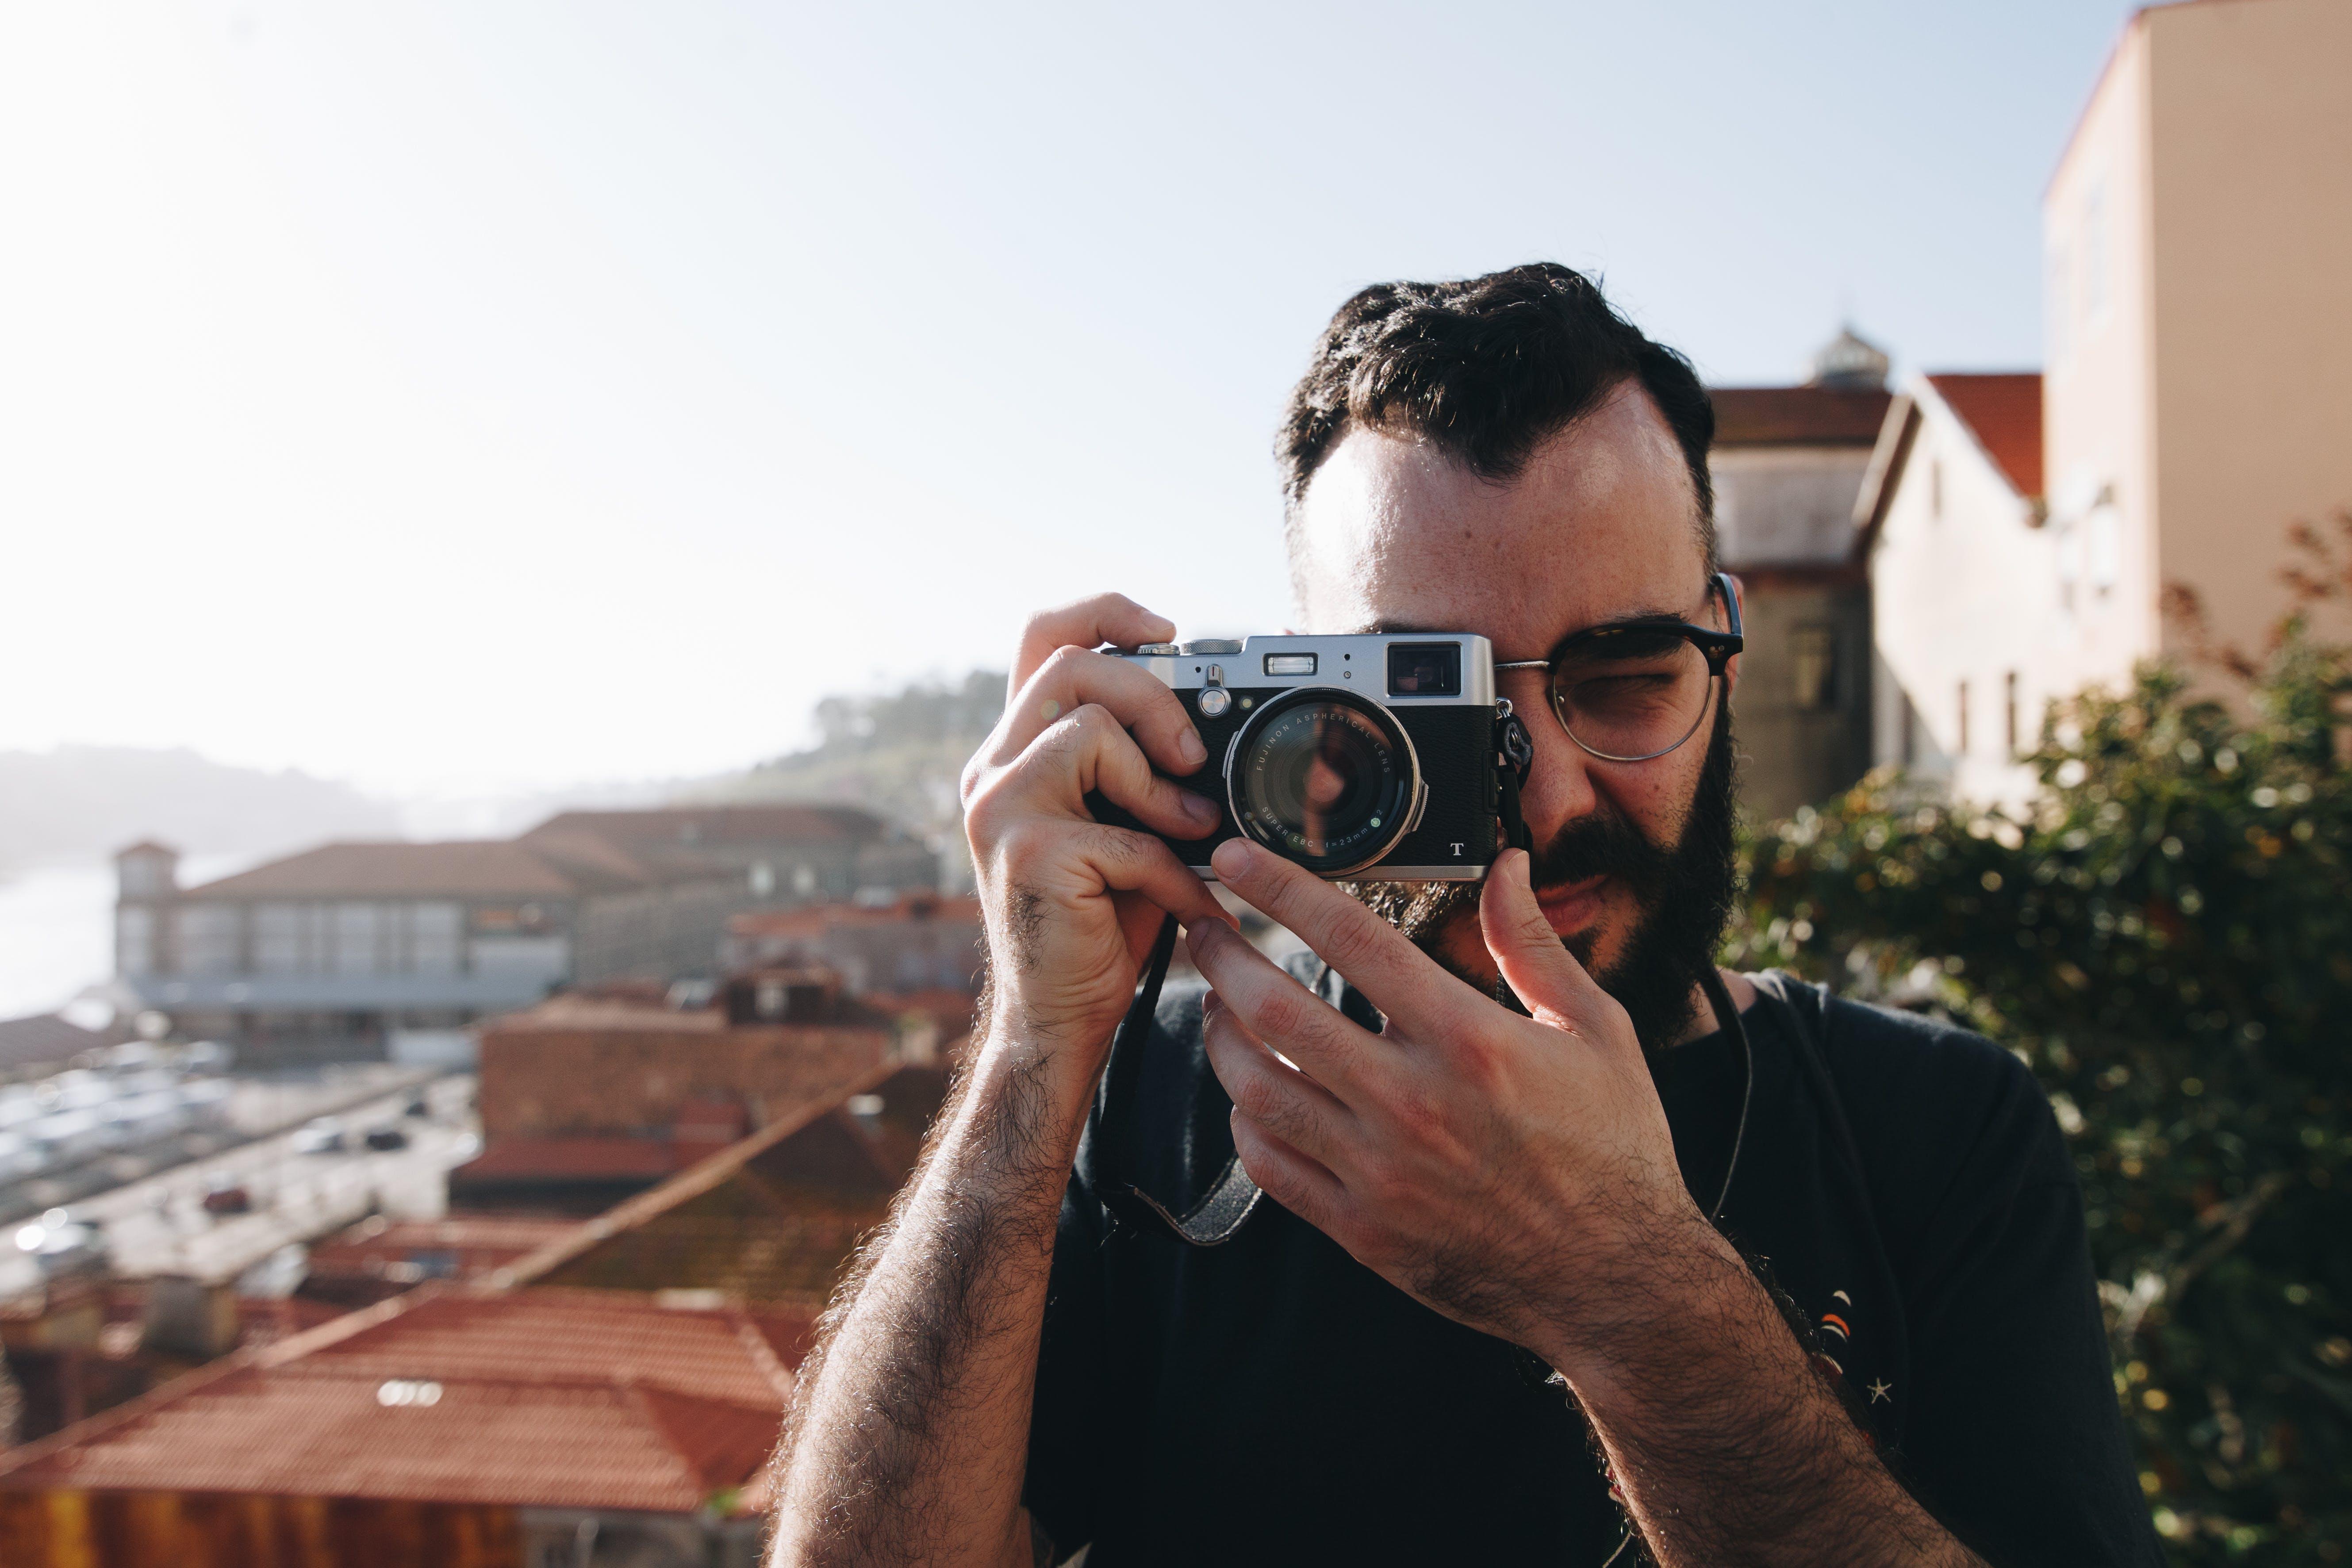 Man Holding Gray Point-and-shoot Camera